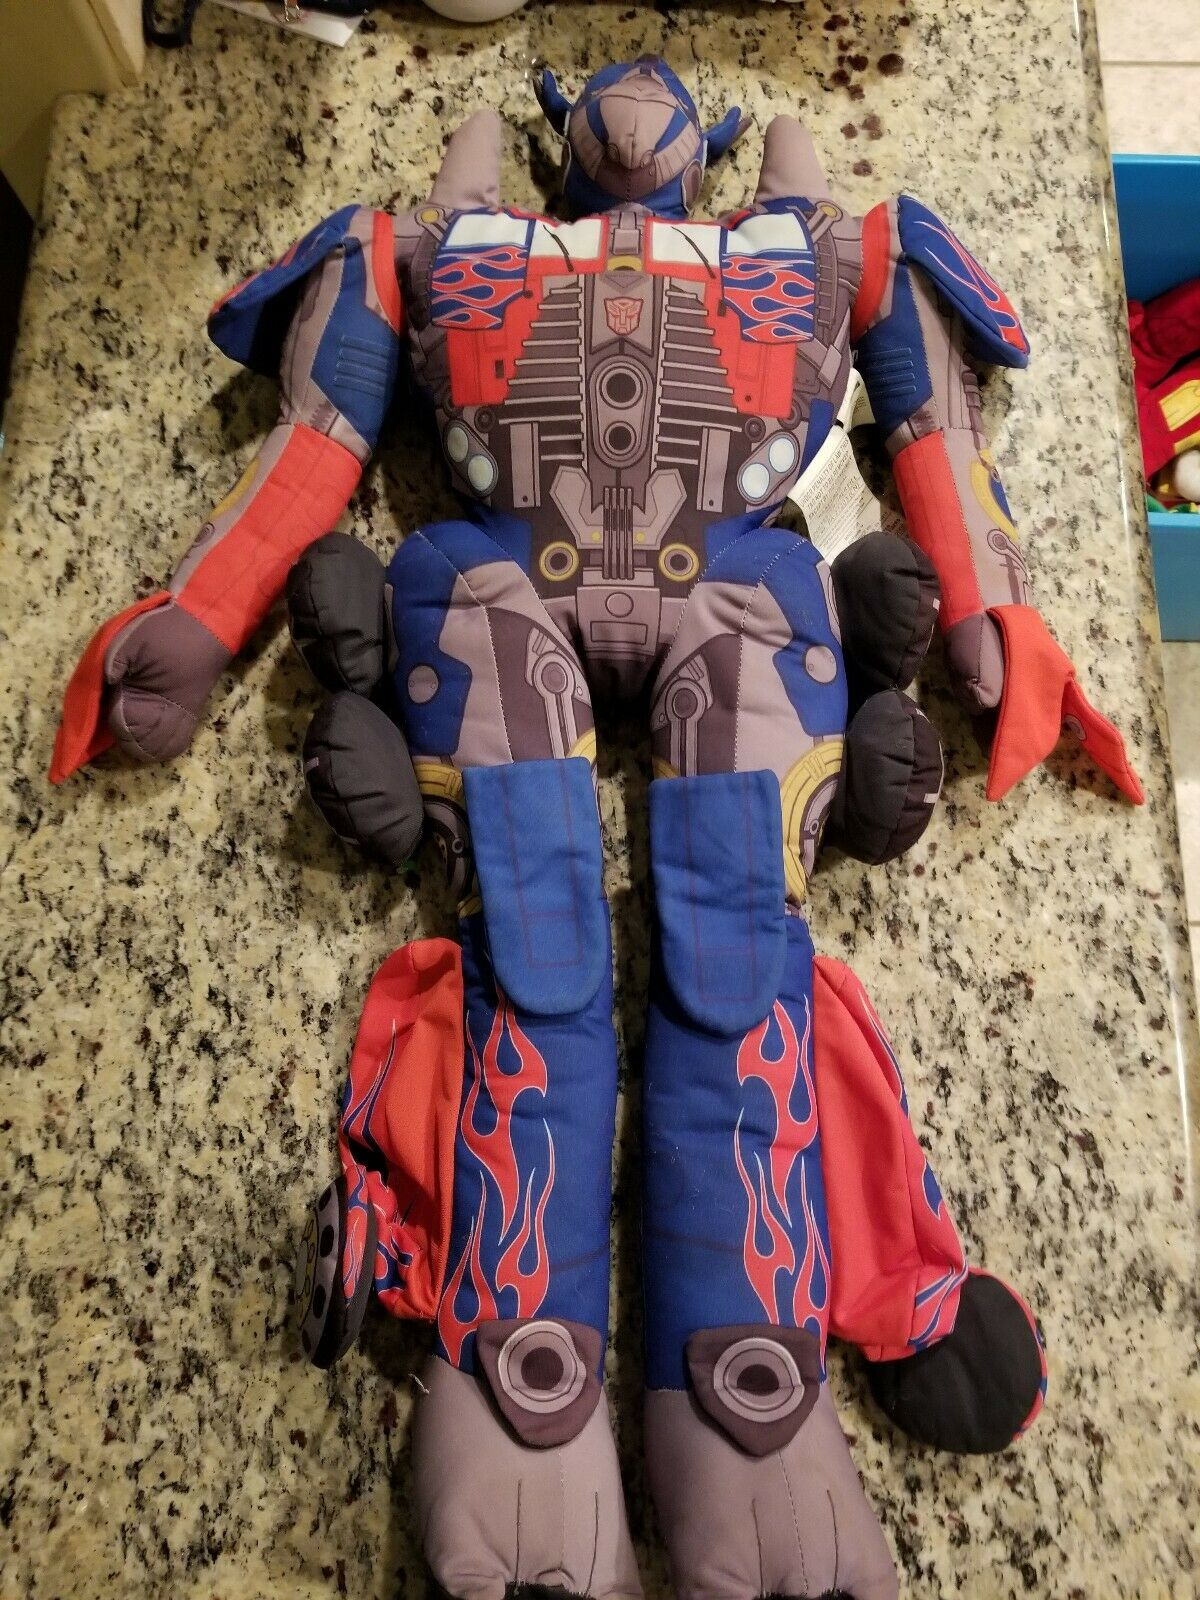 2007 Transformers Optimus Prime Plush Movie doll 32  Hasbro FREE SHIPPING